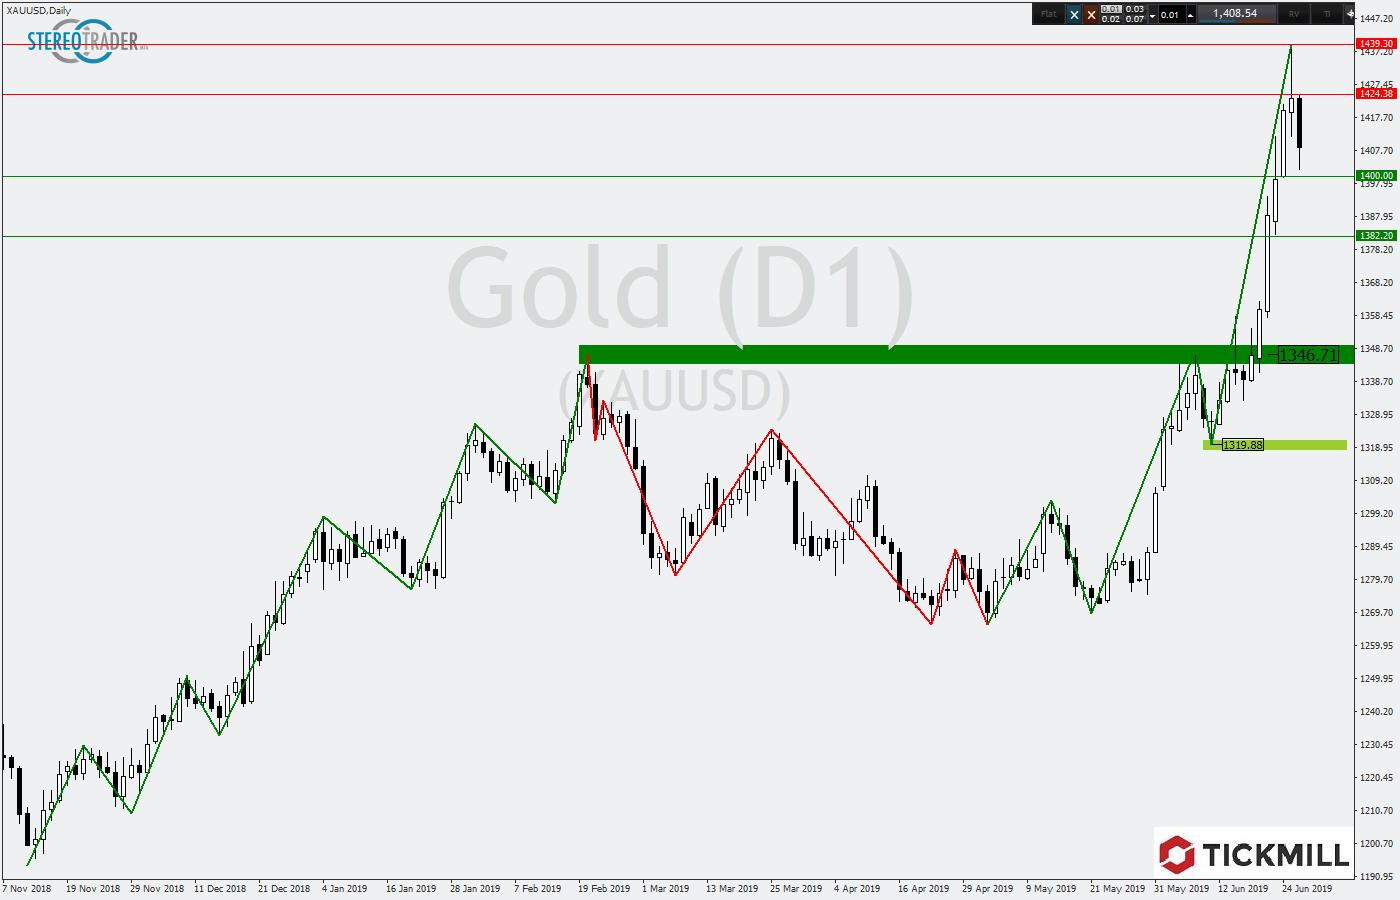 Tickmill-Analyse: Gold im Tageschart mit Umkehrsignal